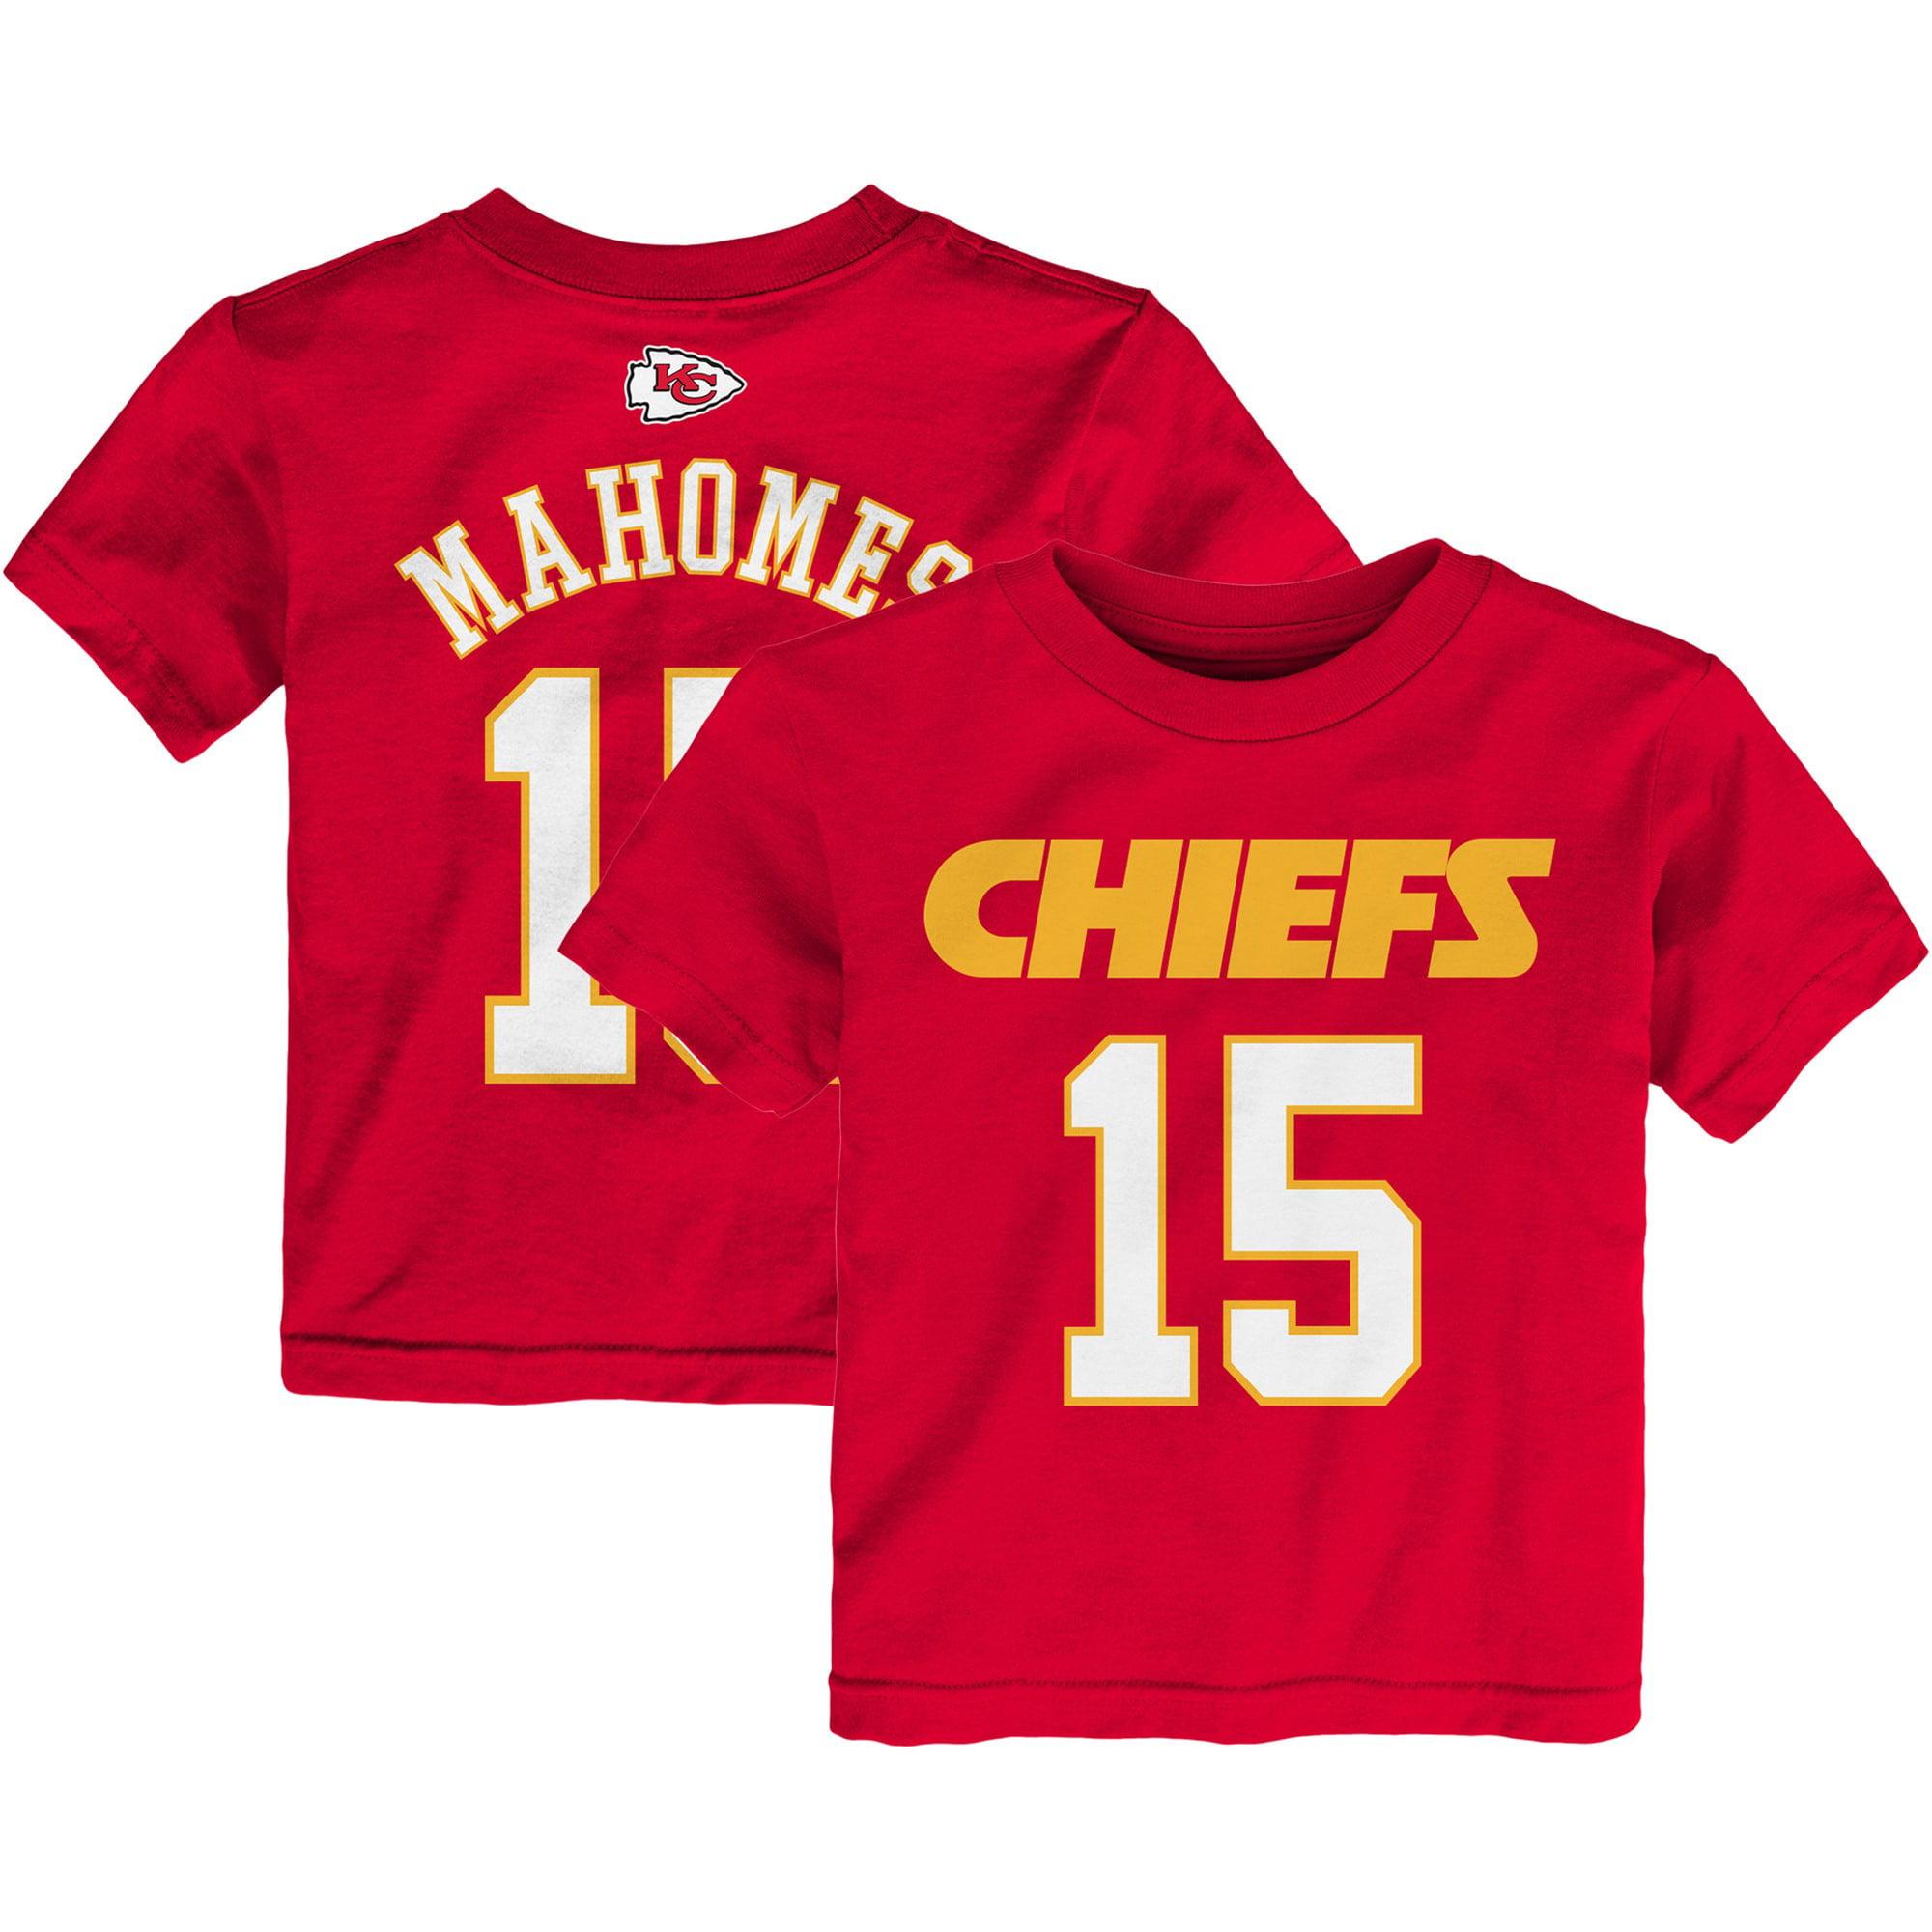 Tanktop Long Sleeve T-Shirt Sweater Hoodie Mahomes 15 Jersey Kansas City Football Quarterback No.15#15 Fans Jerseys Unisex T-Shirt Premium Tee